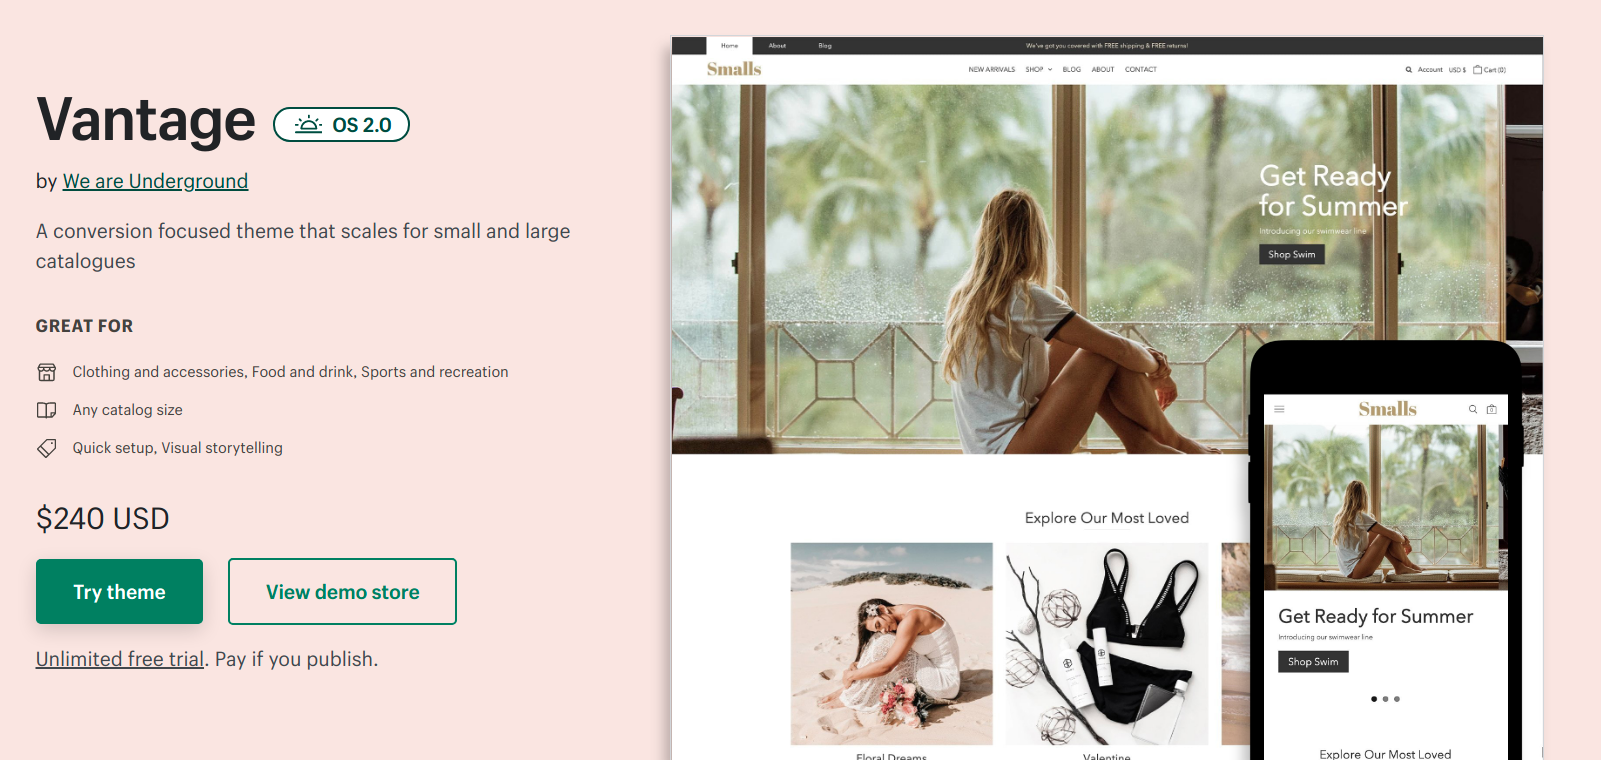 vantage-online-store-2-shopify-theme